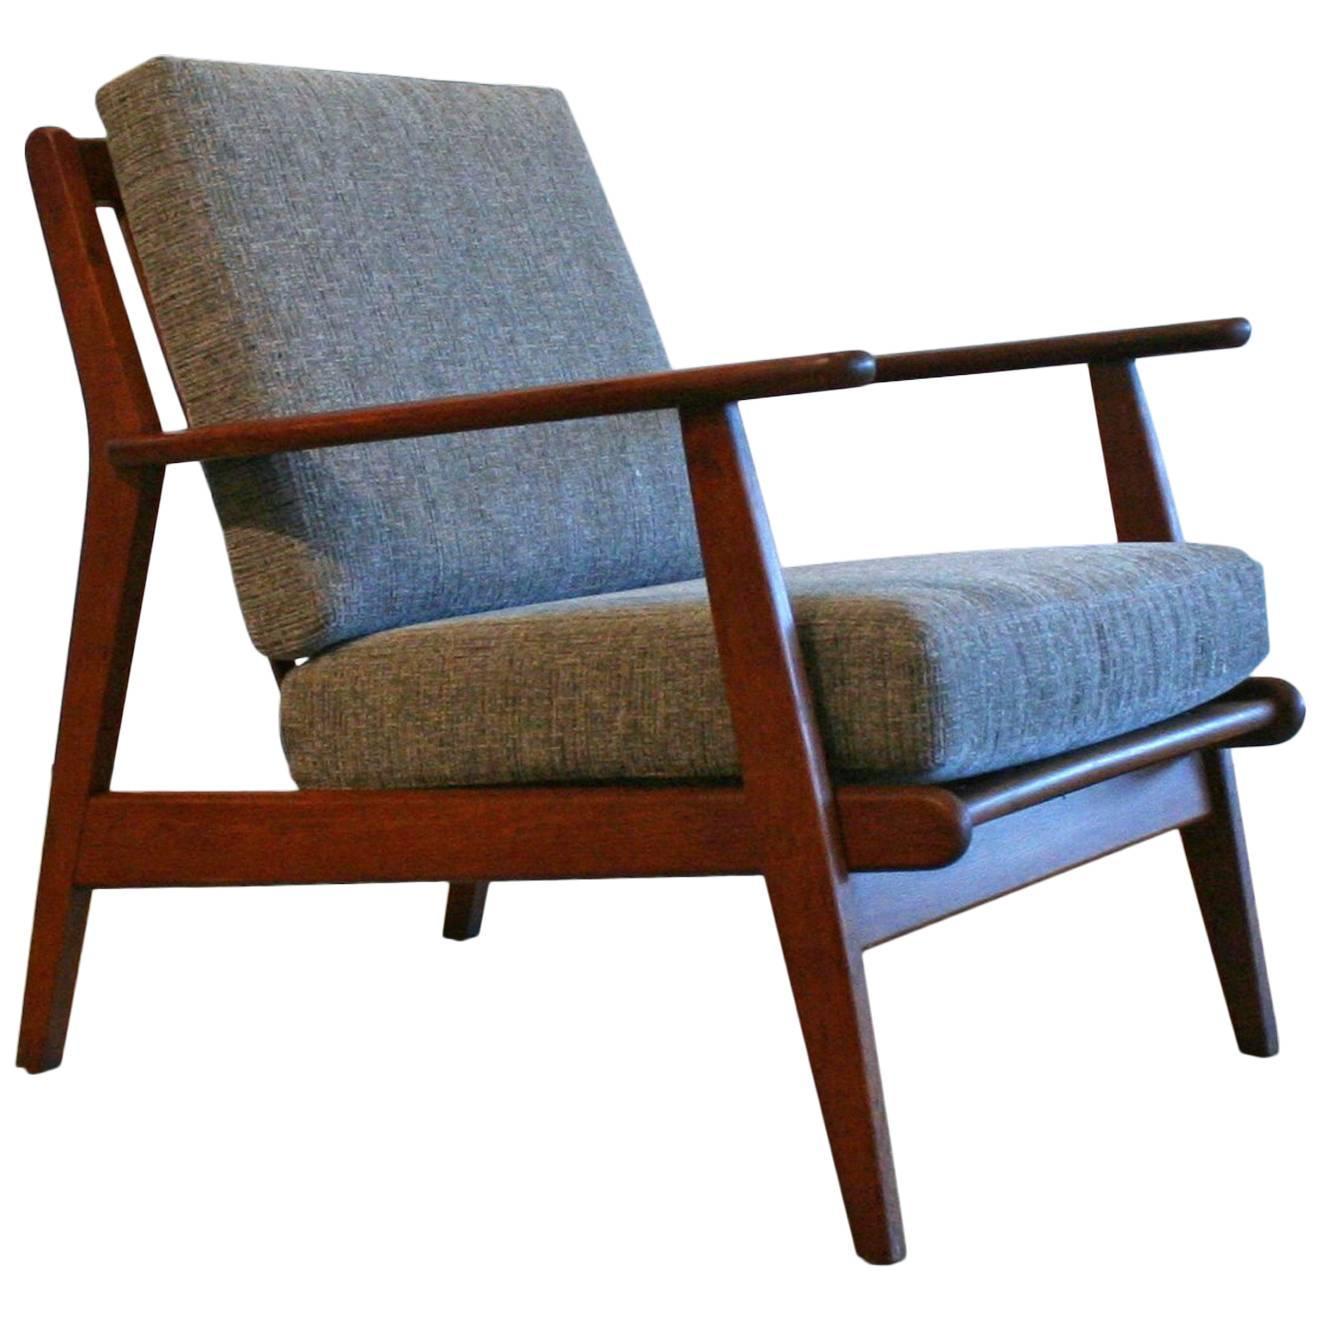 Vintage Danish Teak Lounge Chair at 1stdibs - Danish Teak Lounge Chair At 1stdibs